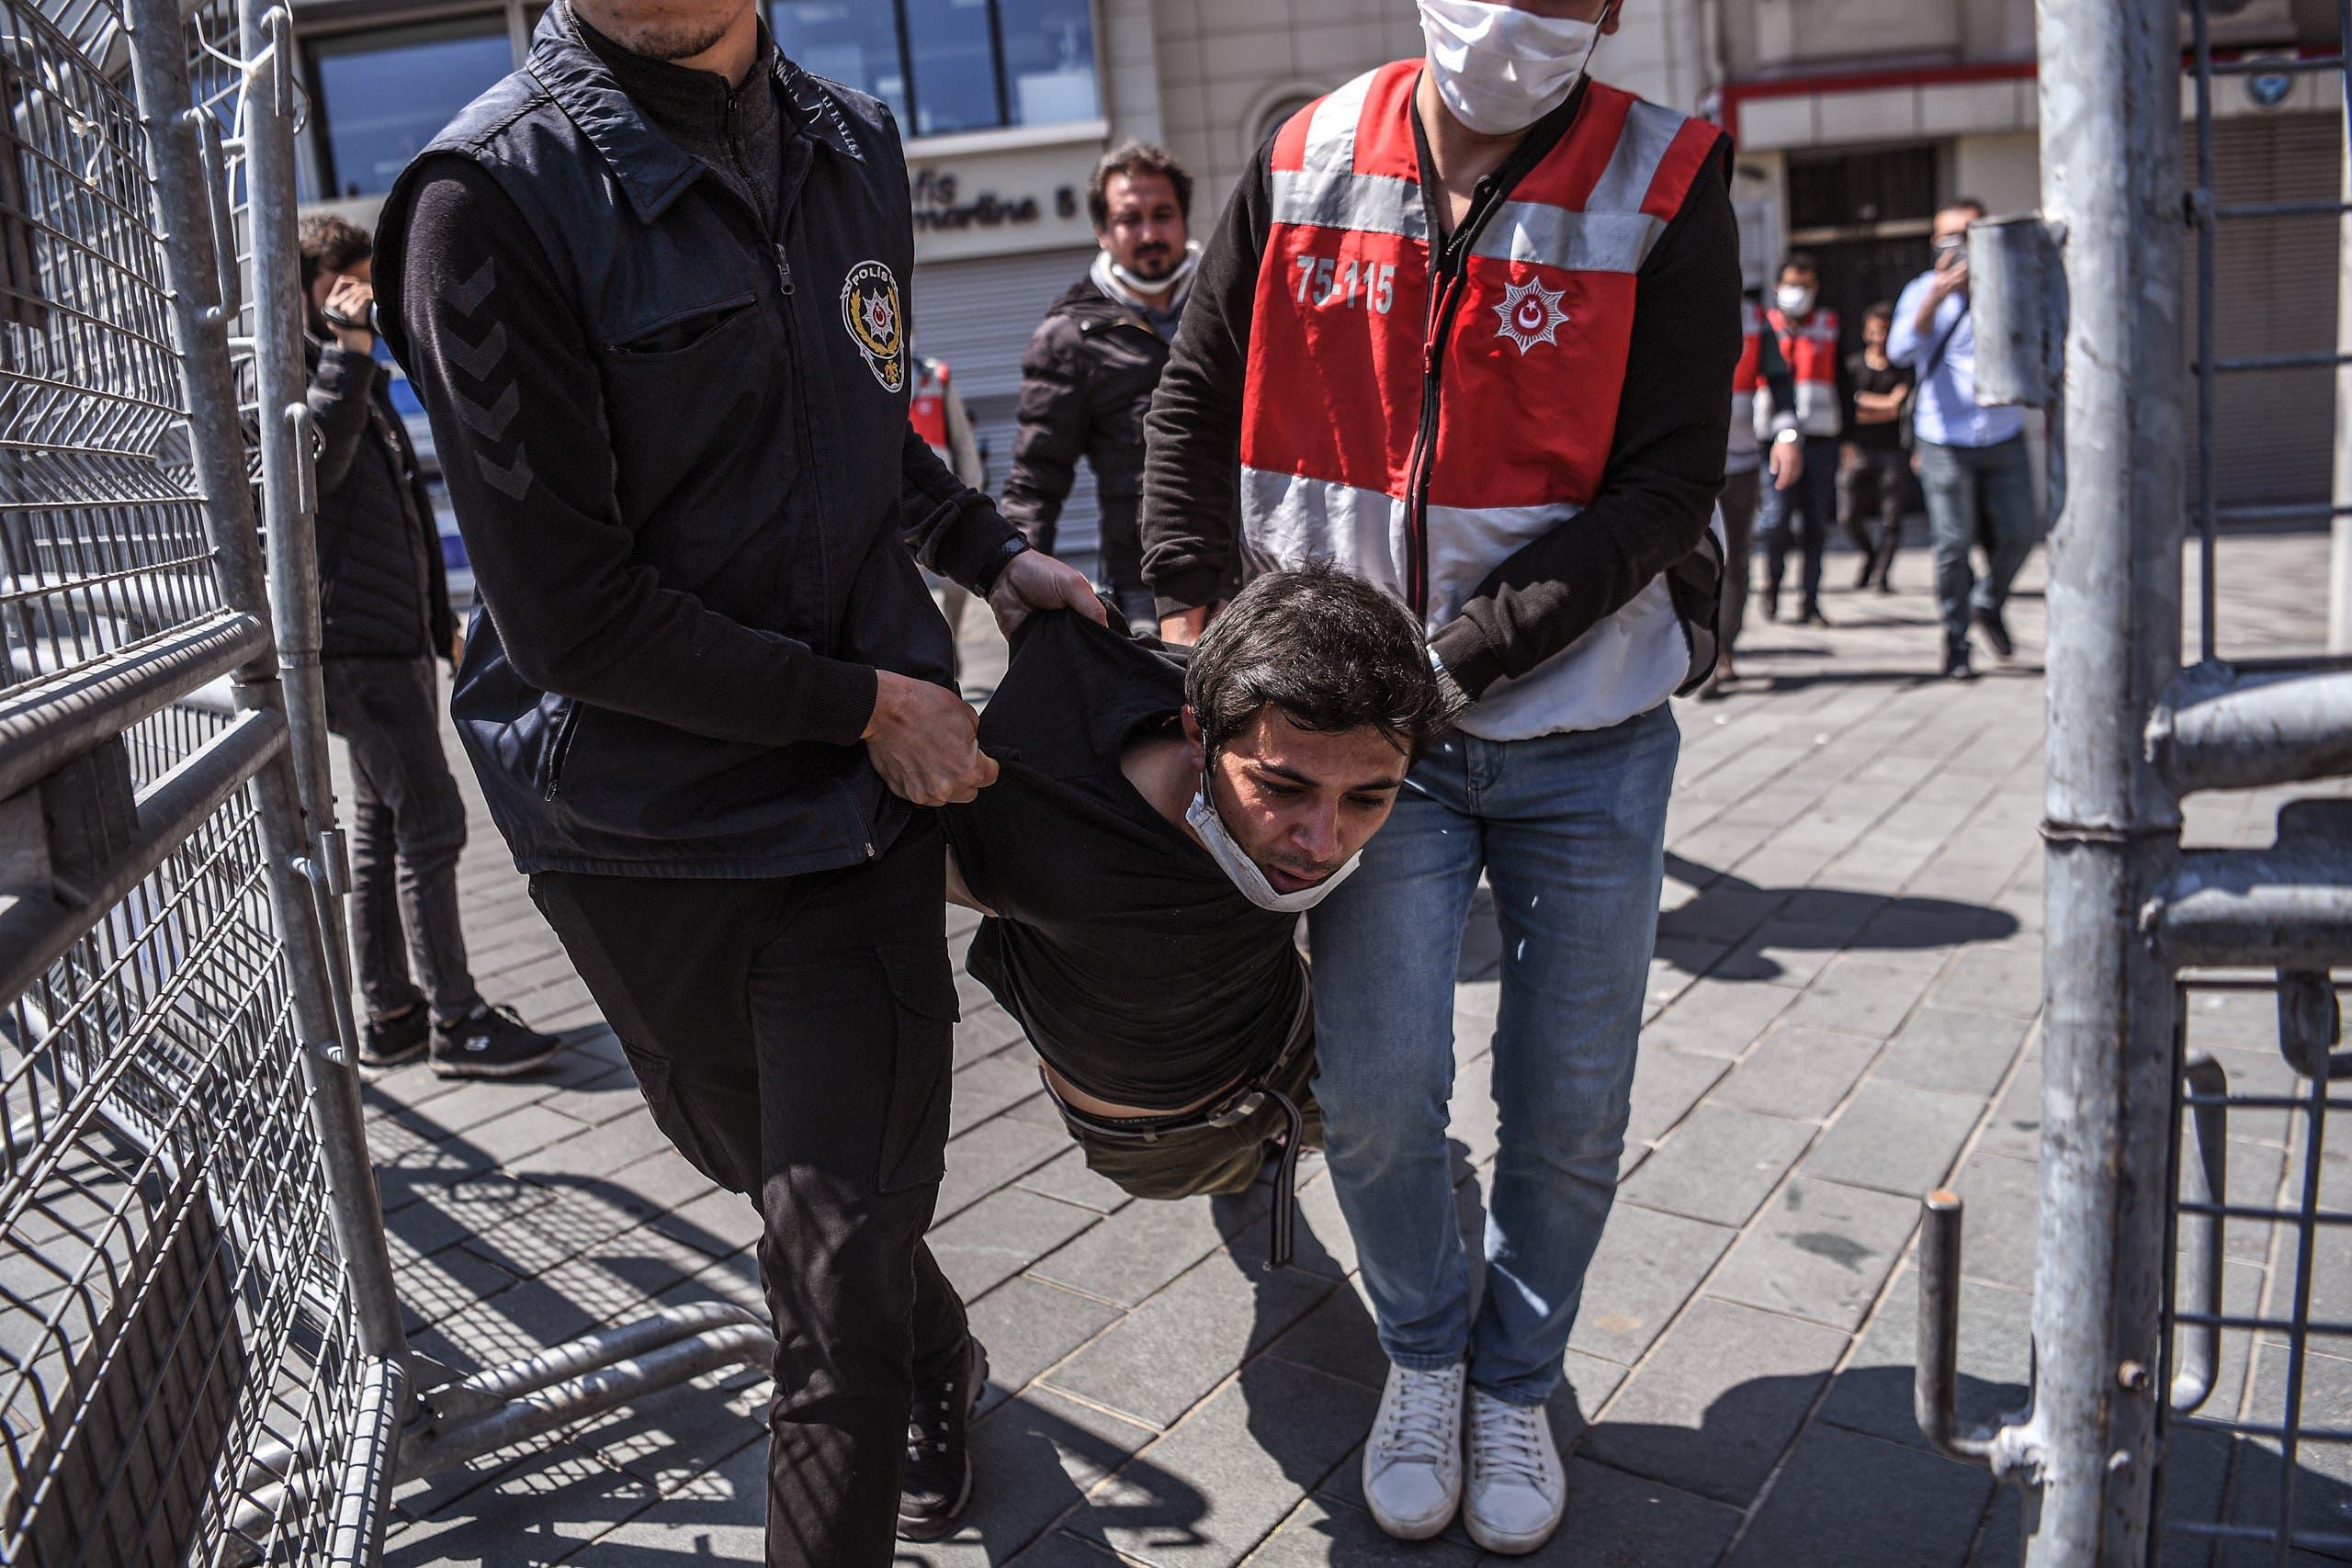 من اسطنبول(1 مايو 2020- فرانس برس)